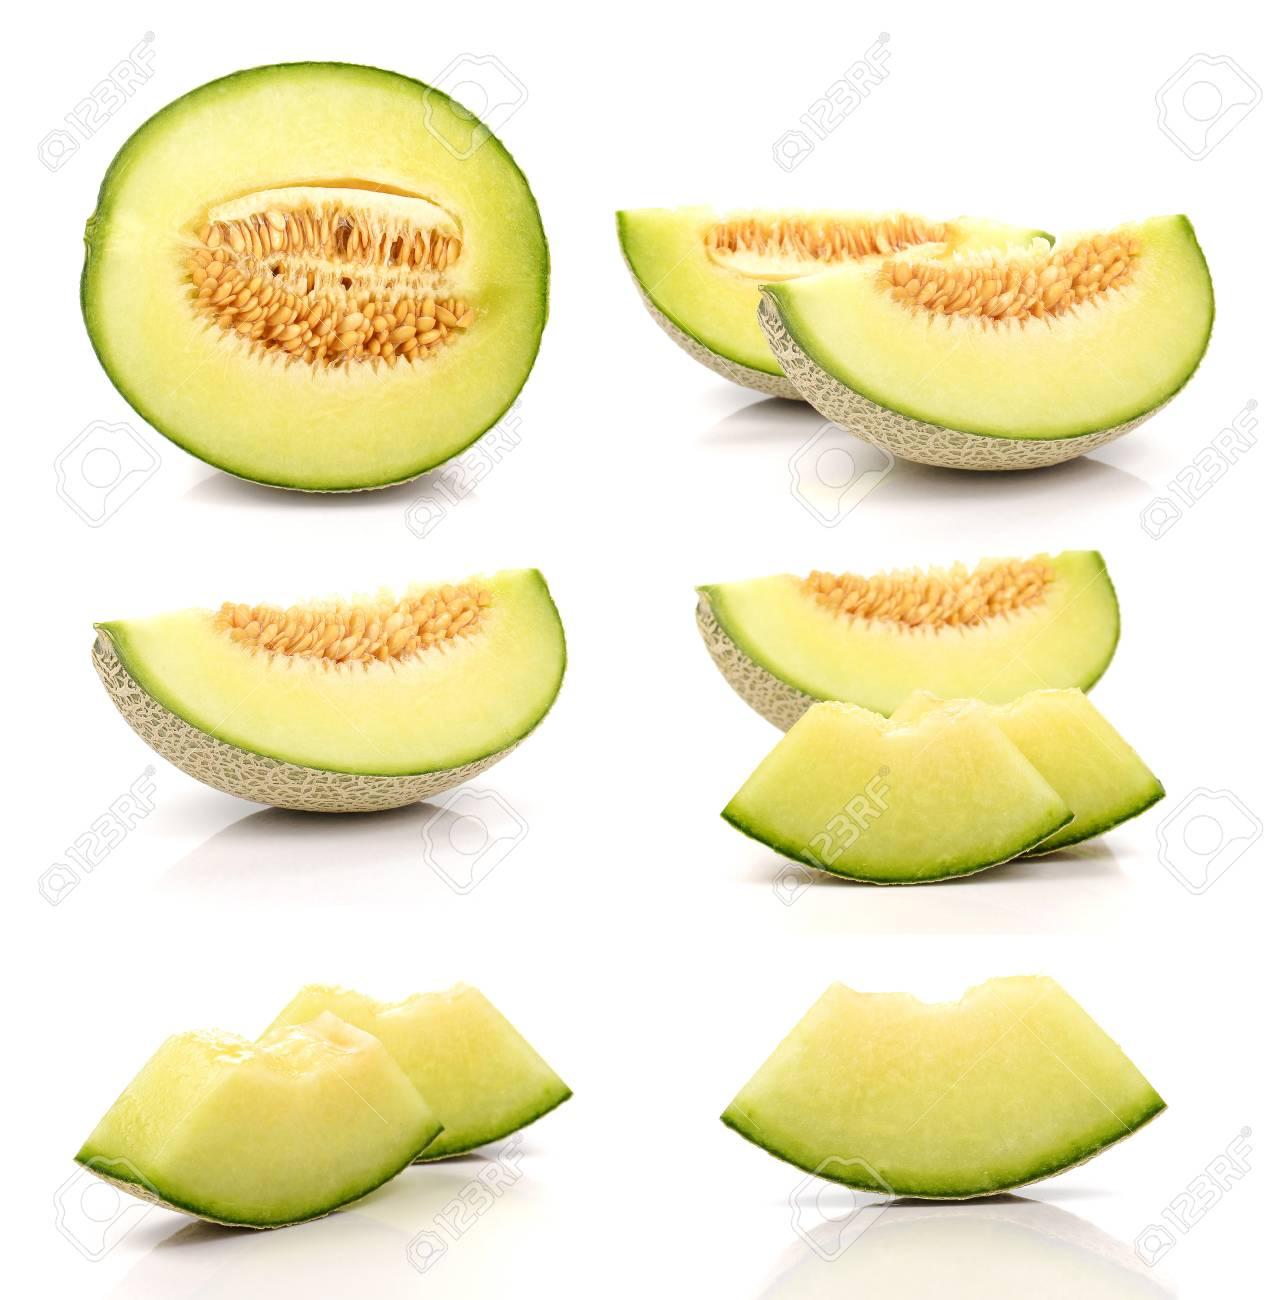 Colección melón cortado piezas aisladas sobre fondo blanco. Foto de archivo  - 58815468 aa2eacccfae4